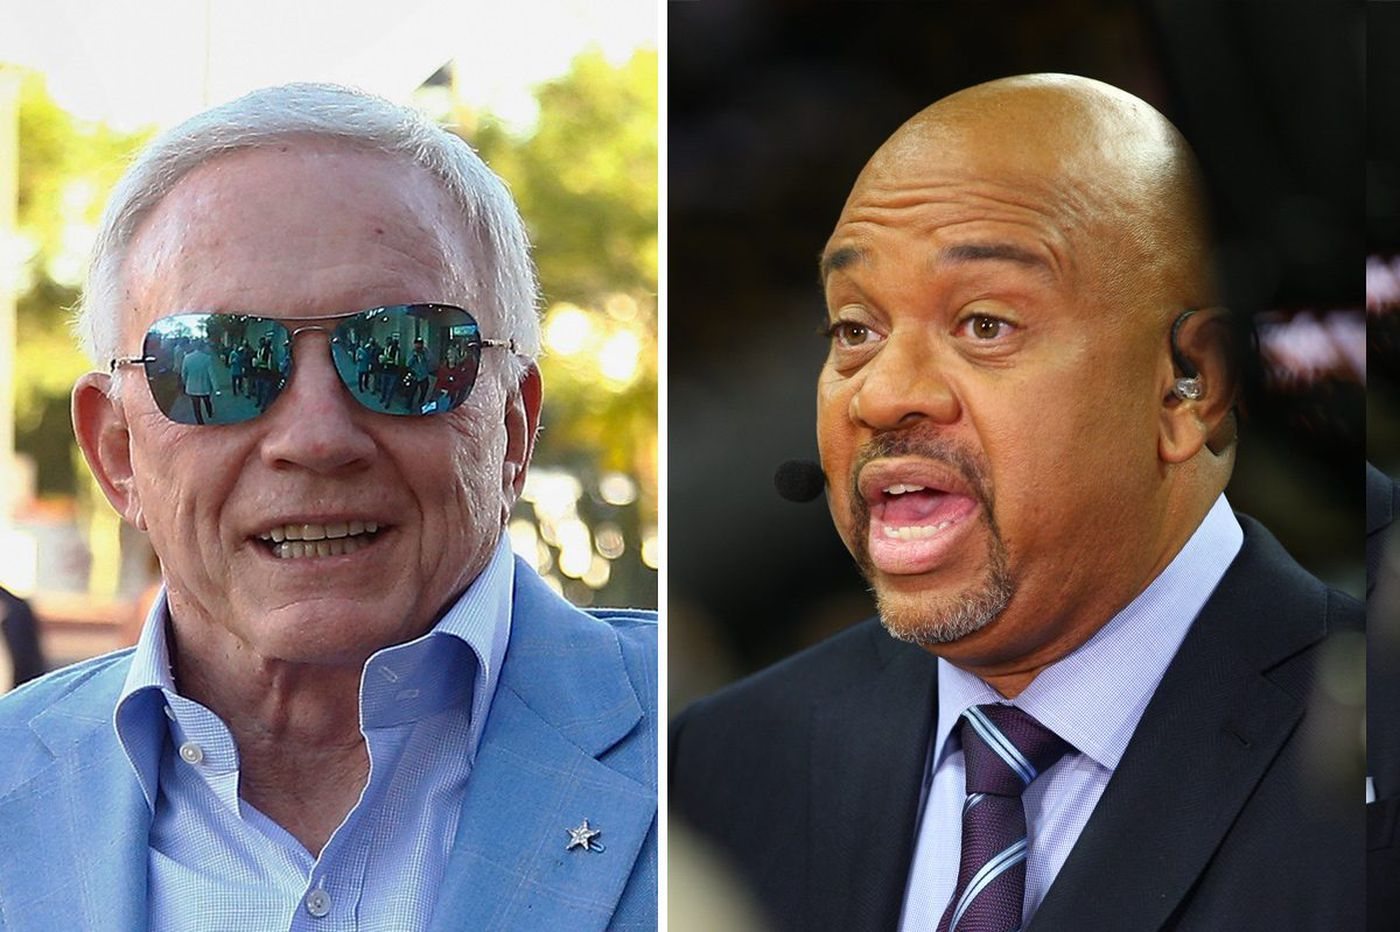 ESPN host Michael Wilbon compares Jerry Jones to a slaveholder